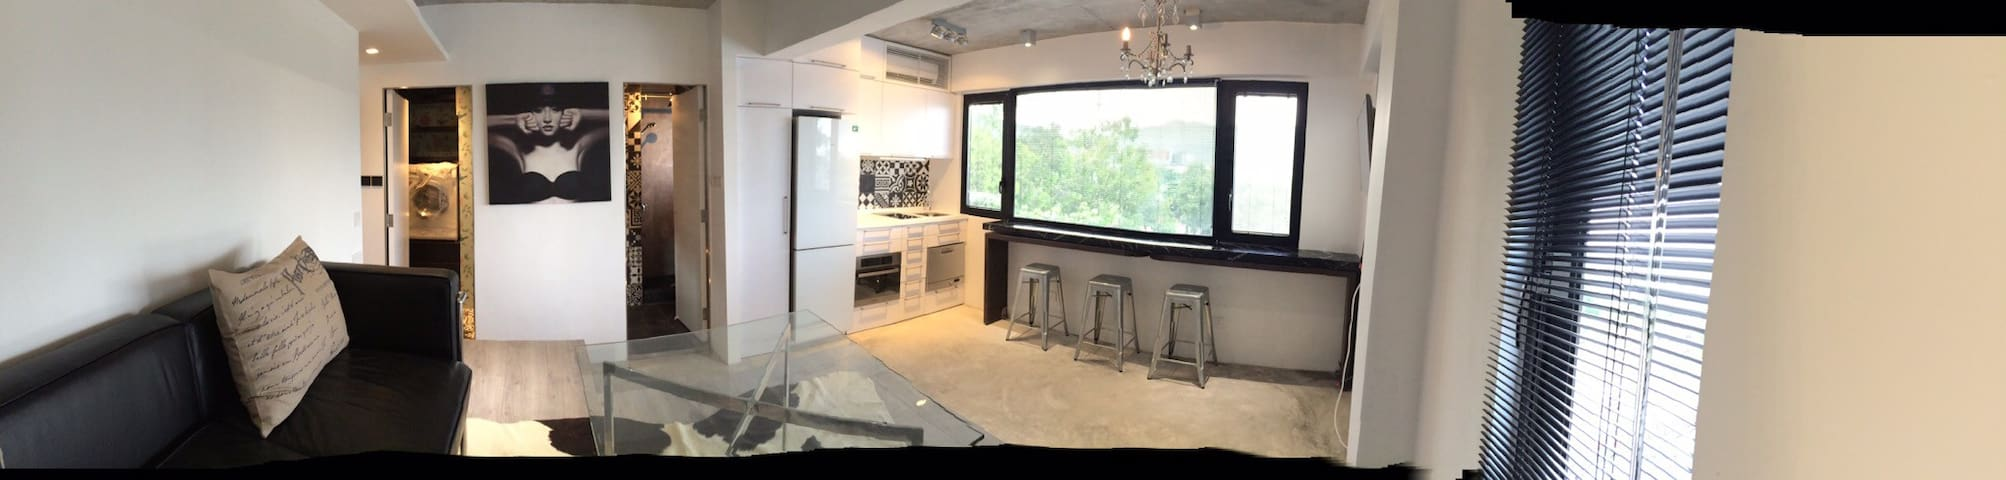 5/FL walk-up luxury studio + roof